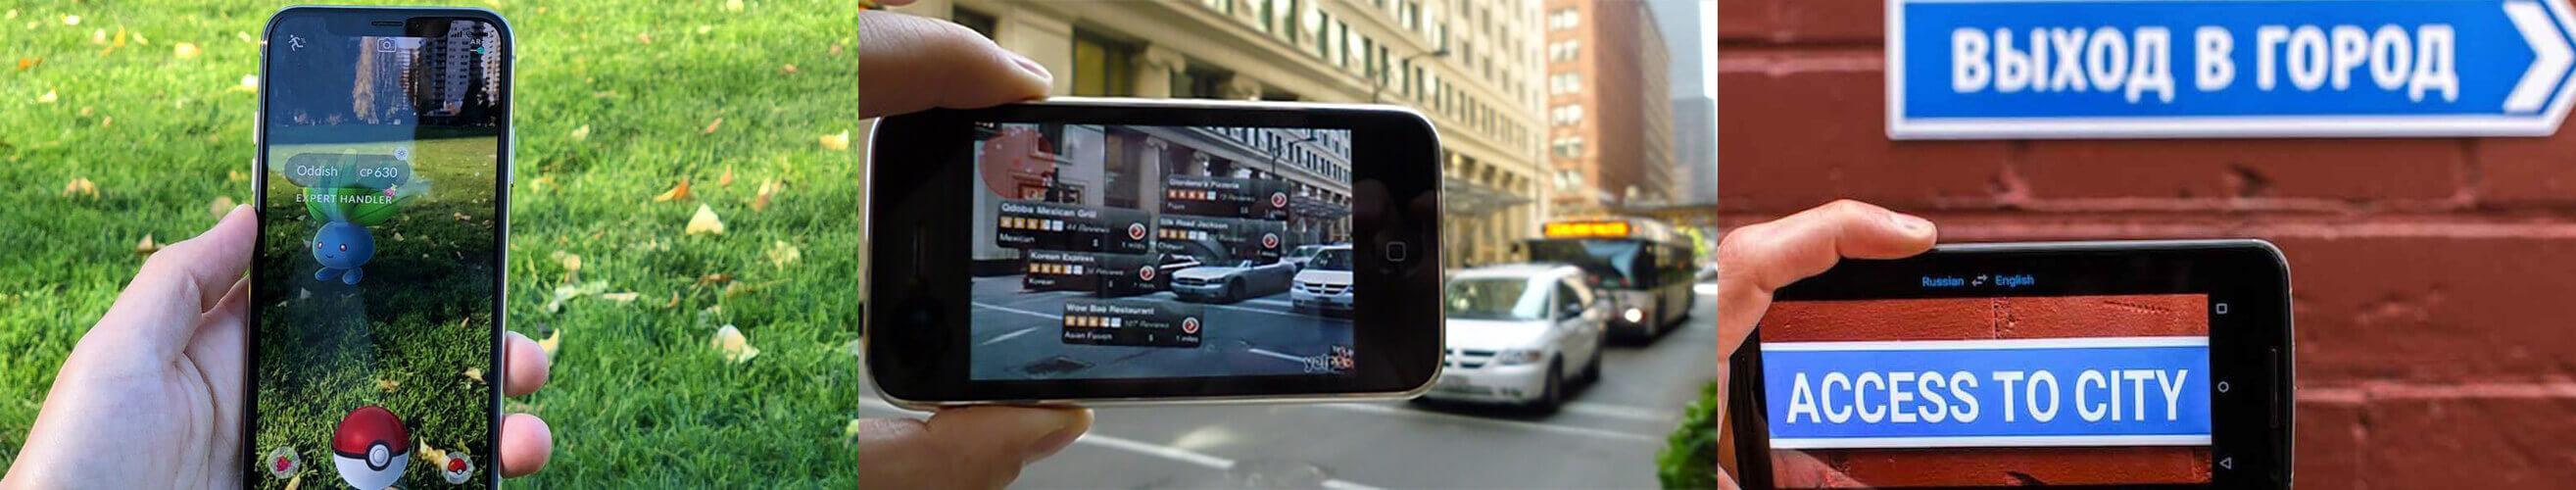 AR Apps: Pokémon GO, Yelp, Google Translate